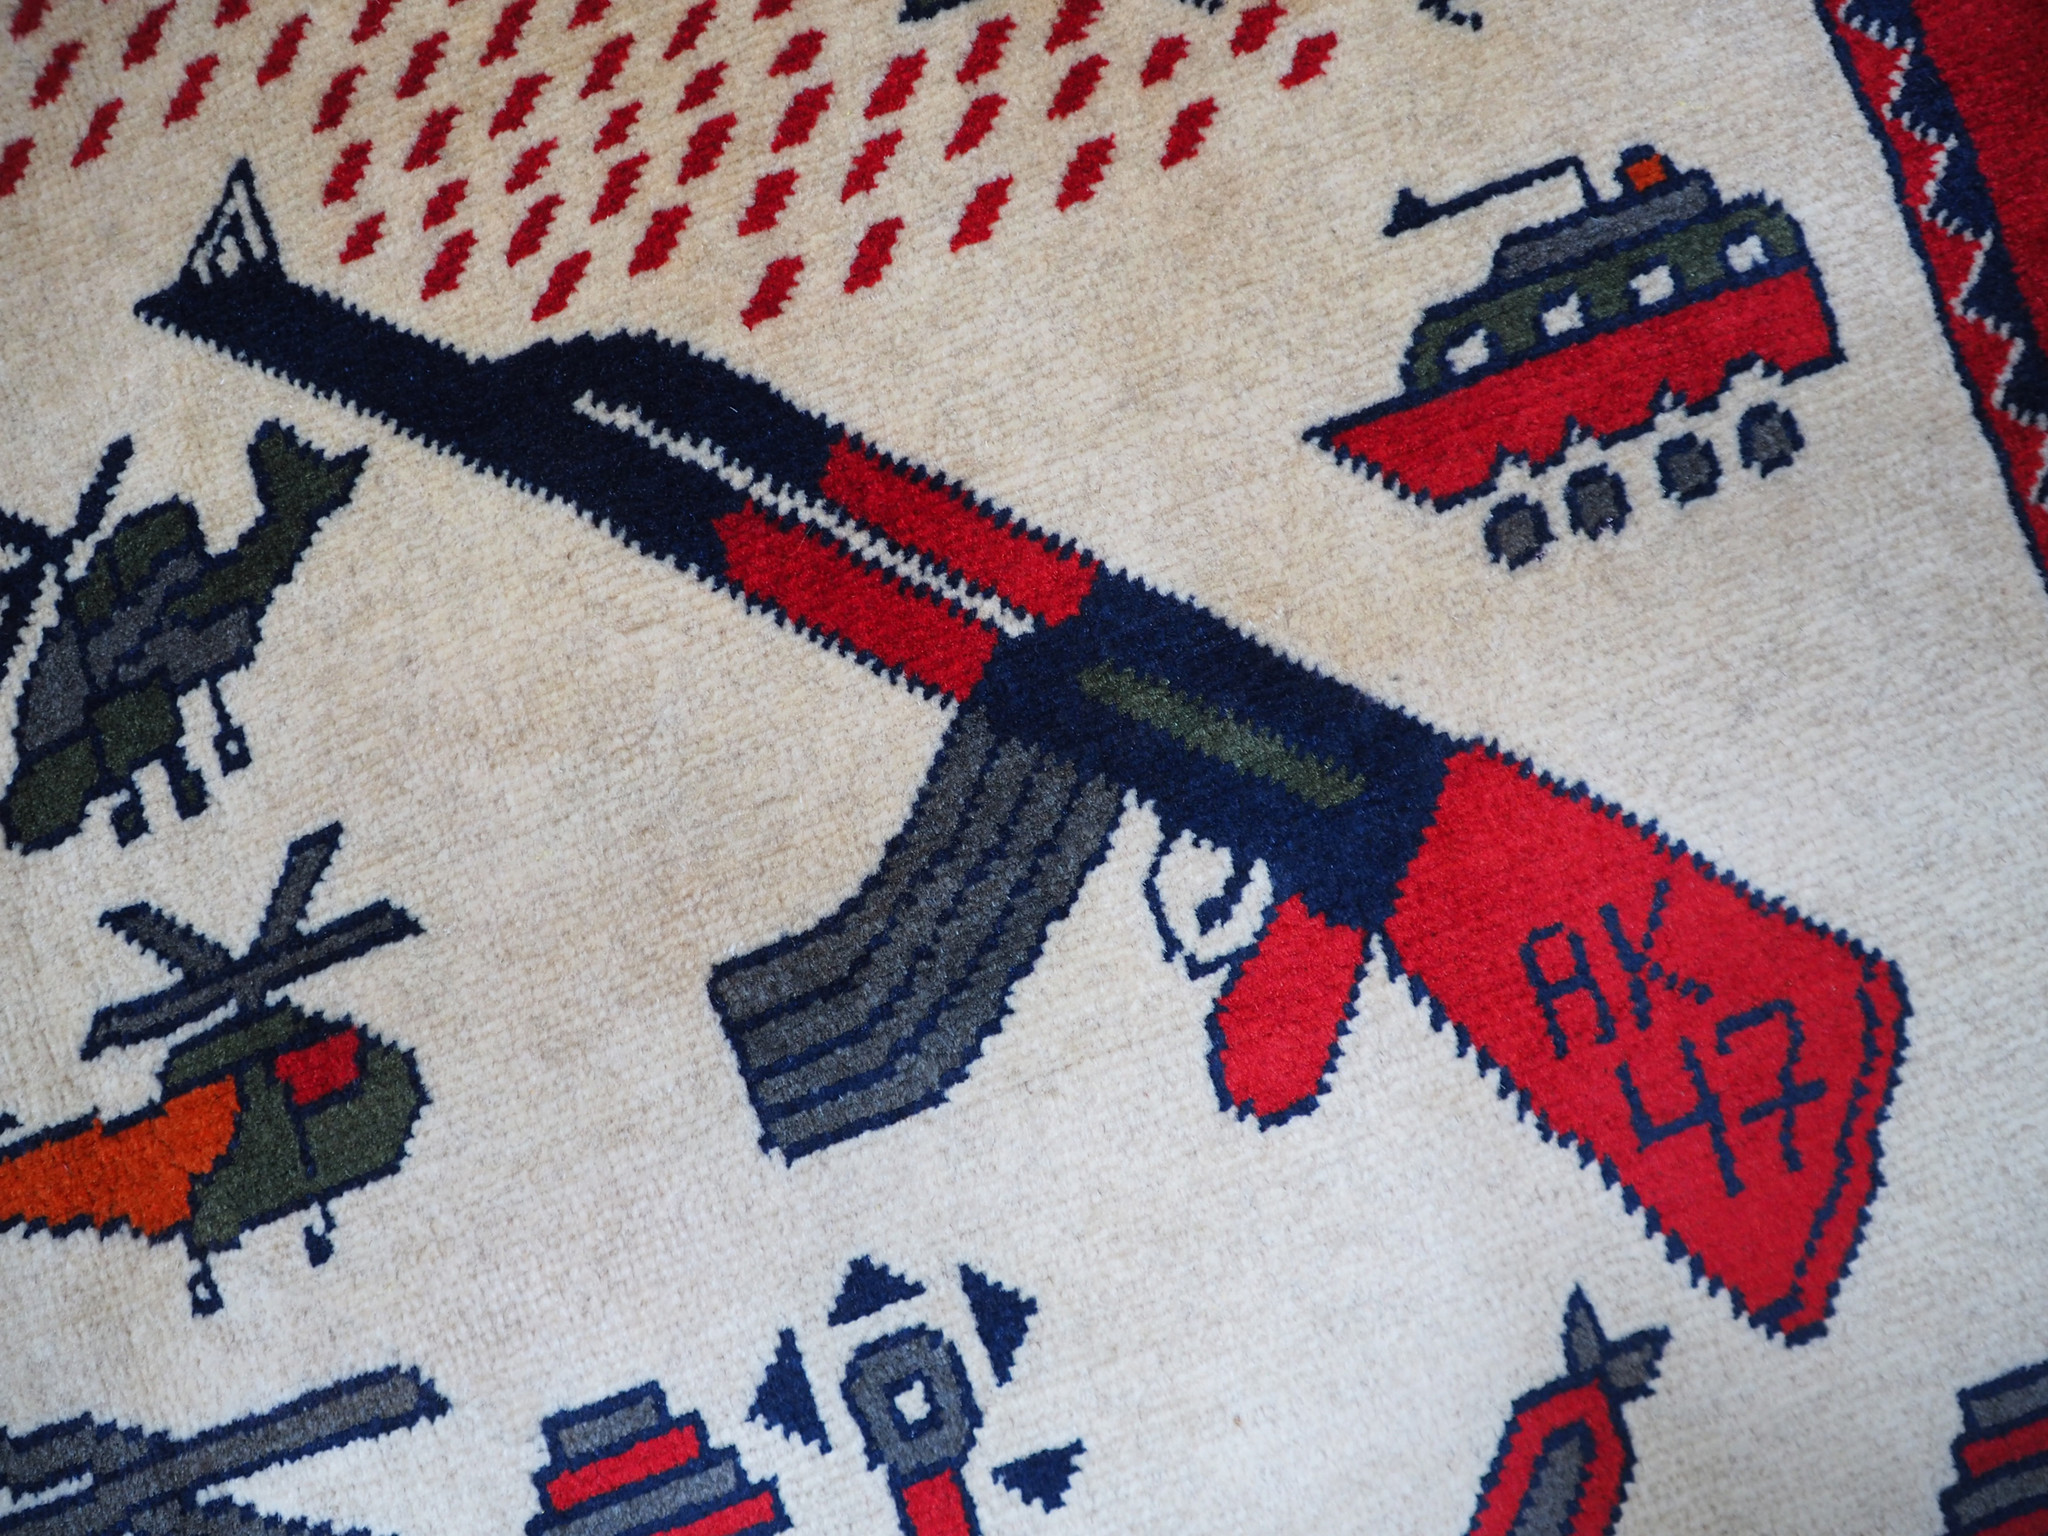 Afghan Kriegteppich Handgeknüpf Teppich Afghanistan panzer kampfjet gewehr USA Army Nato ISAF war rug Nr:19/13